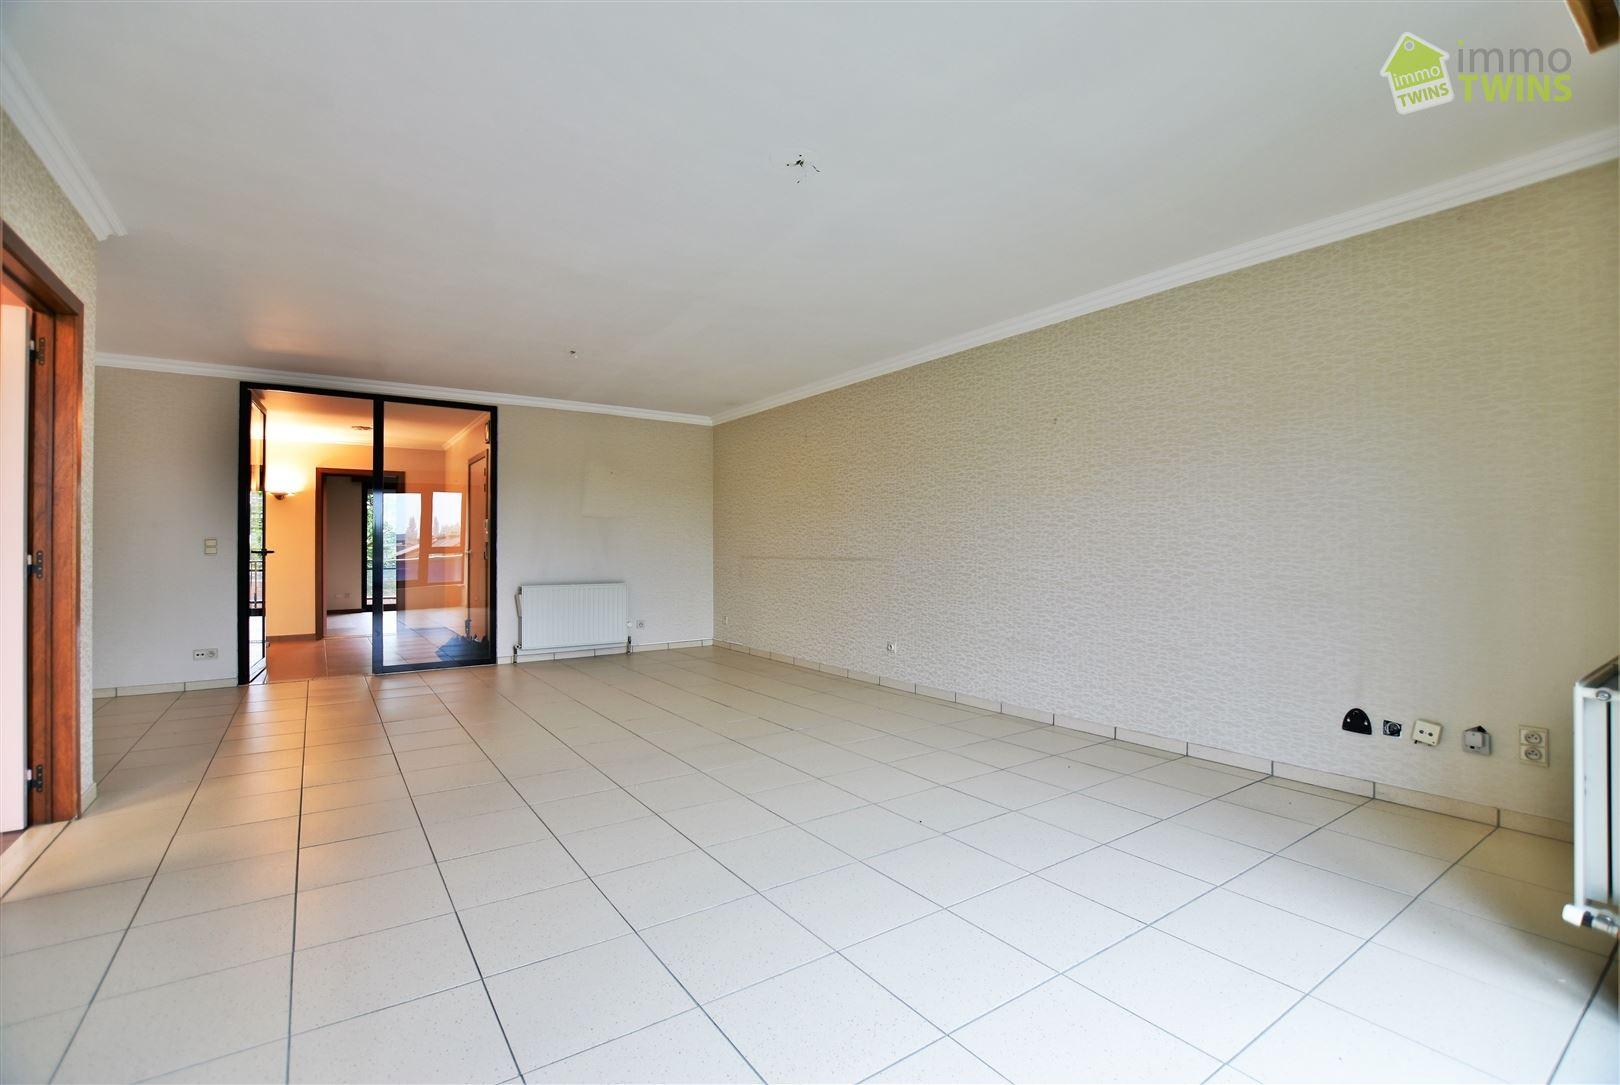 Foto 5 : Appartement te 9200 DENDERMONDE (België) - Prijs € 725